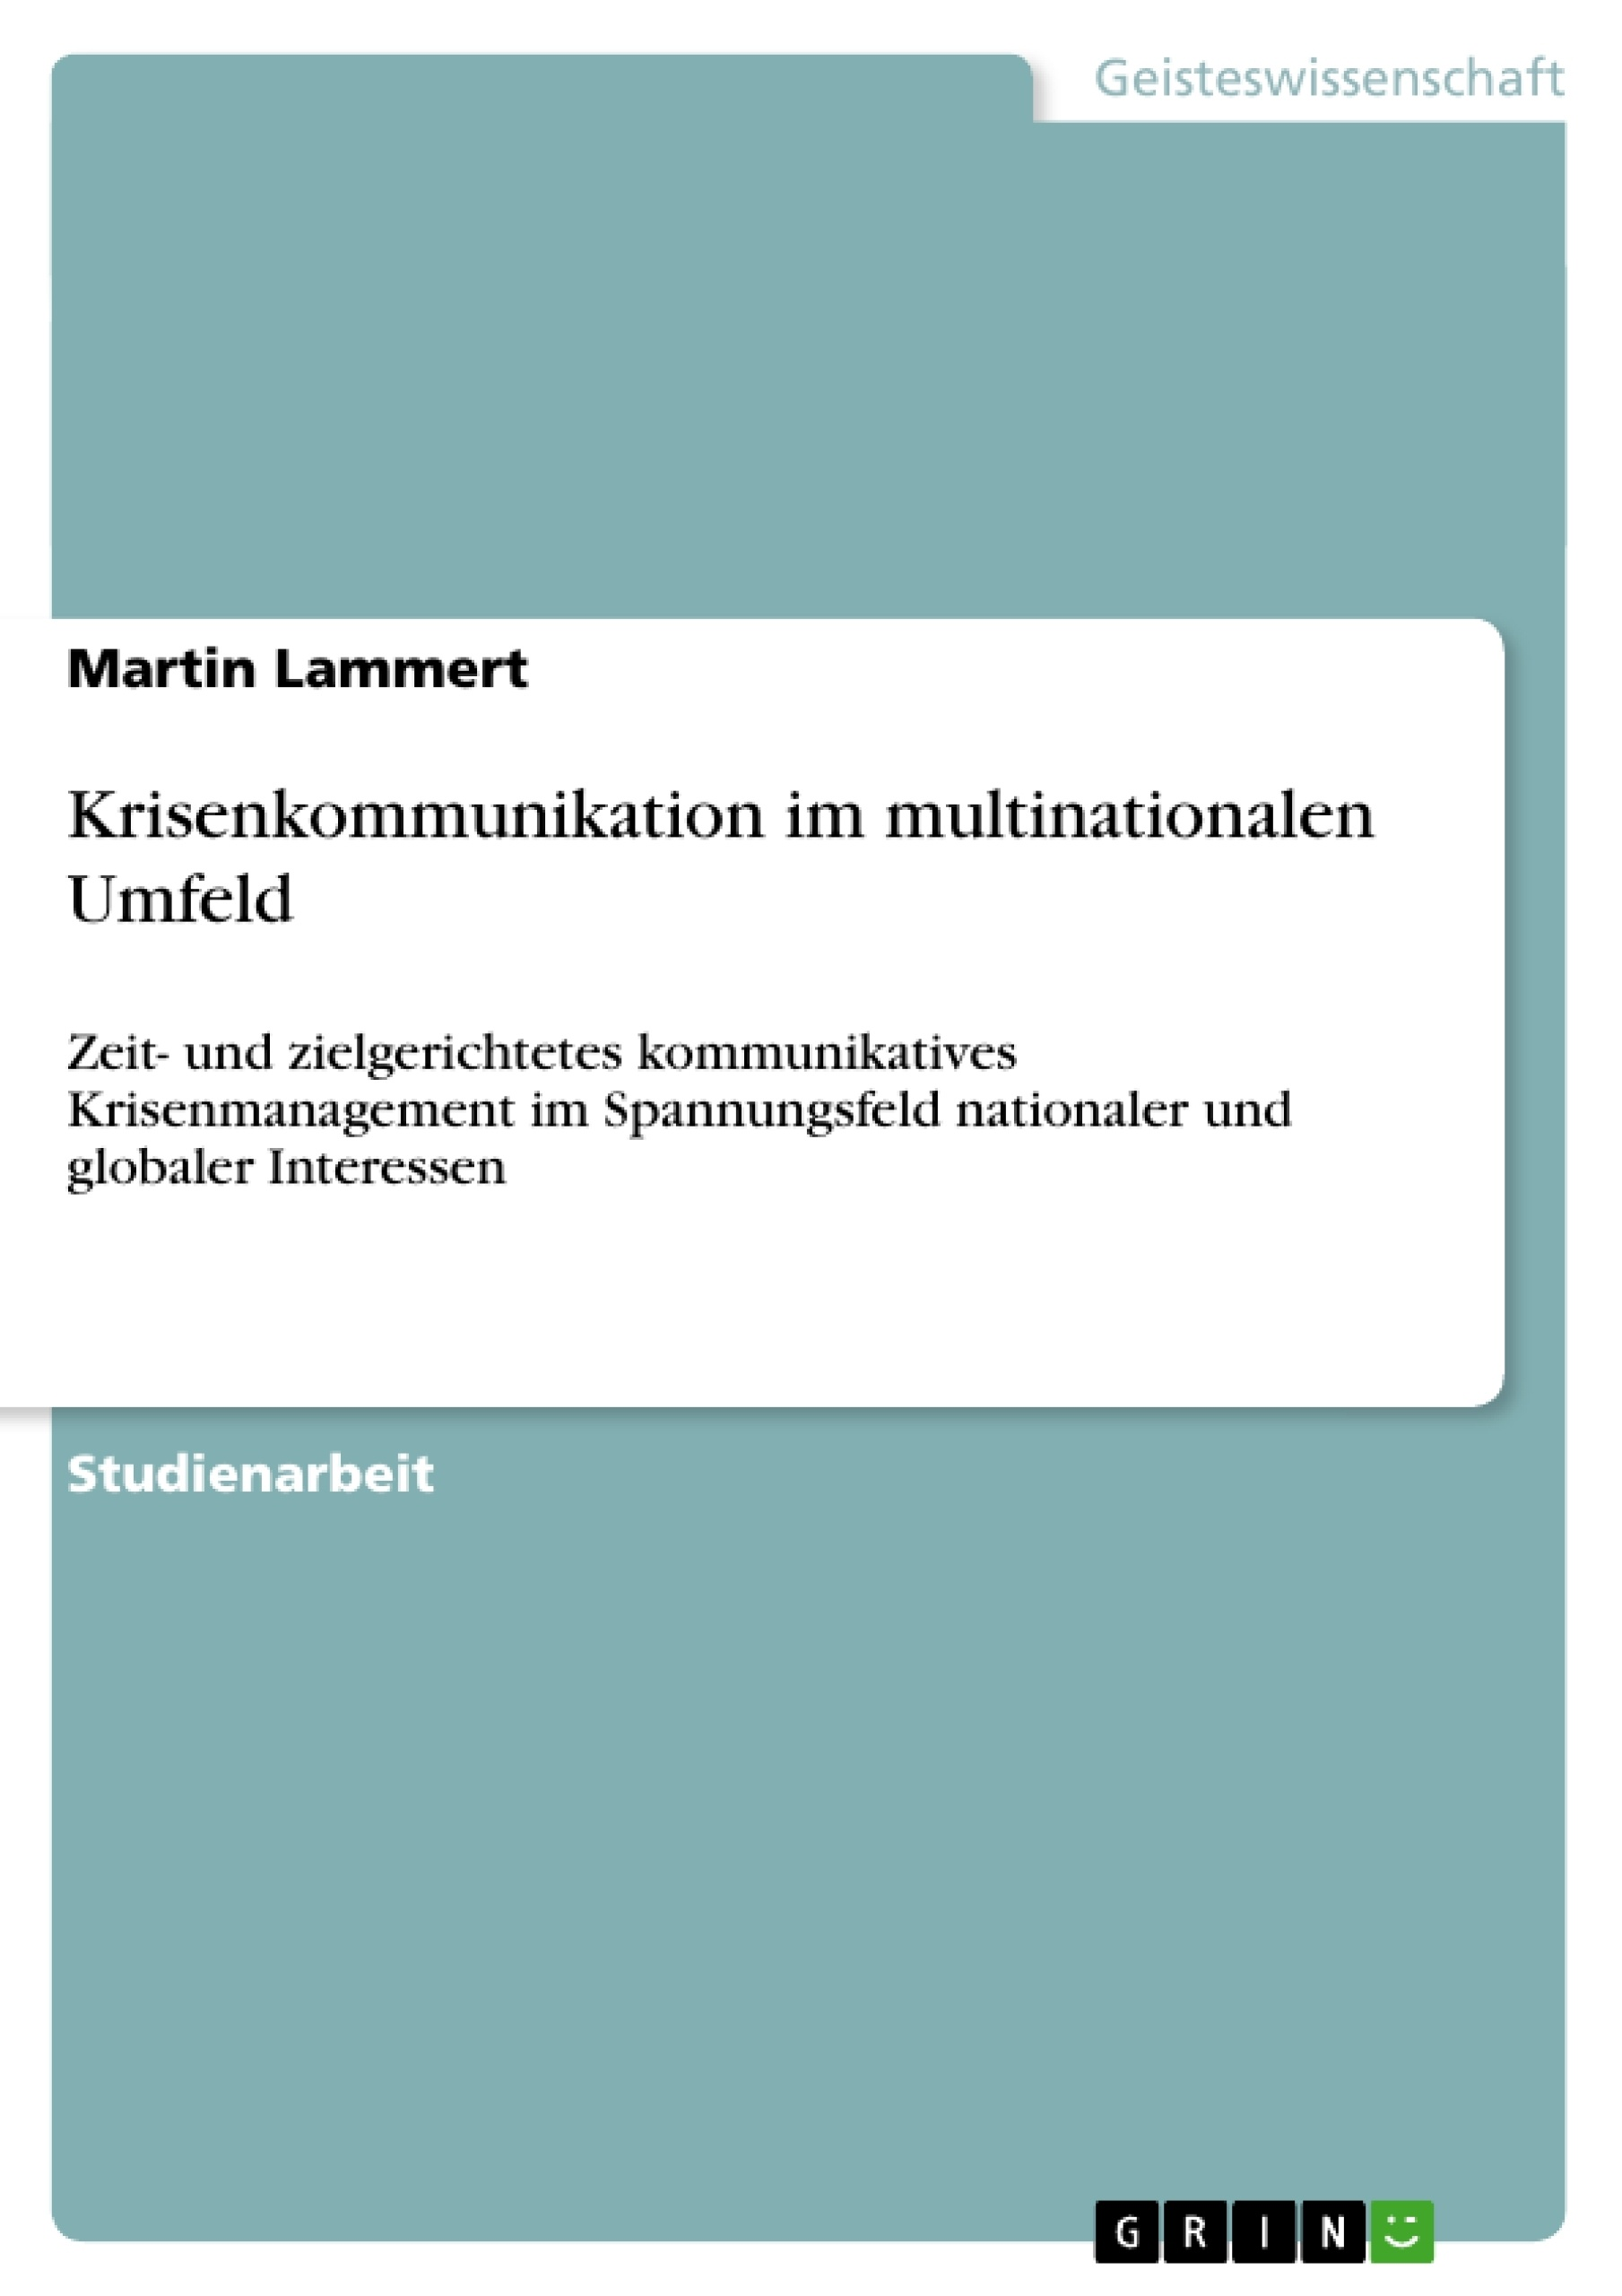 Krisenkommunikation im multinationalen Umfeld   Masterarbeit ...